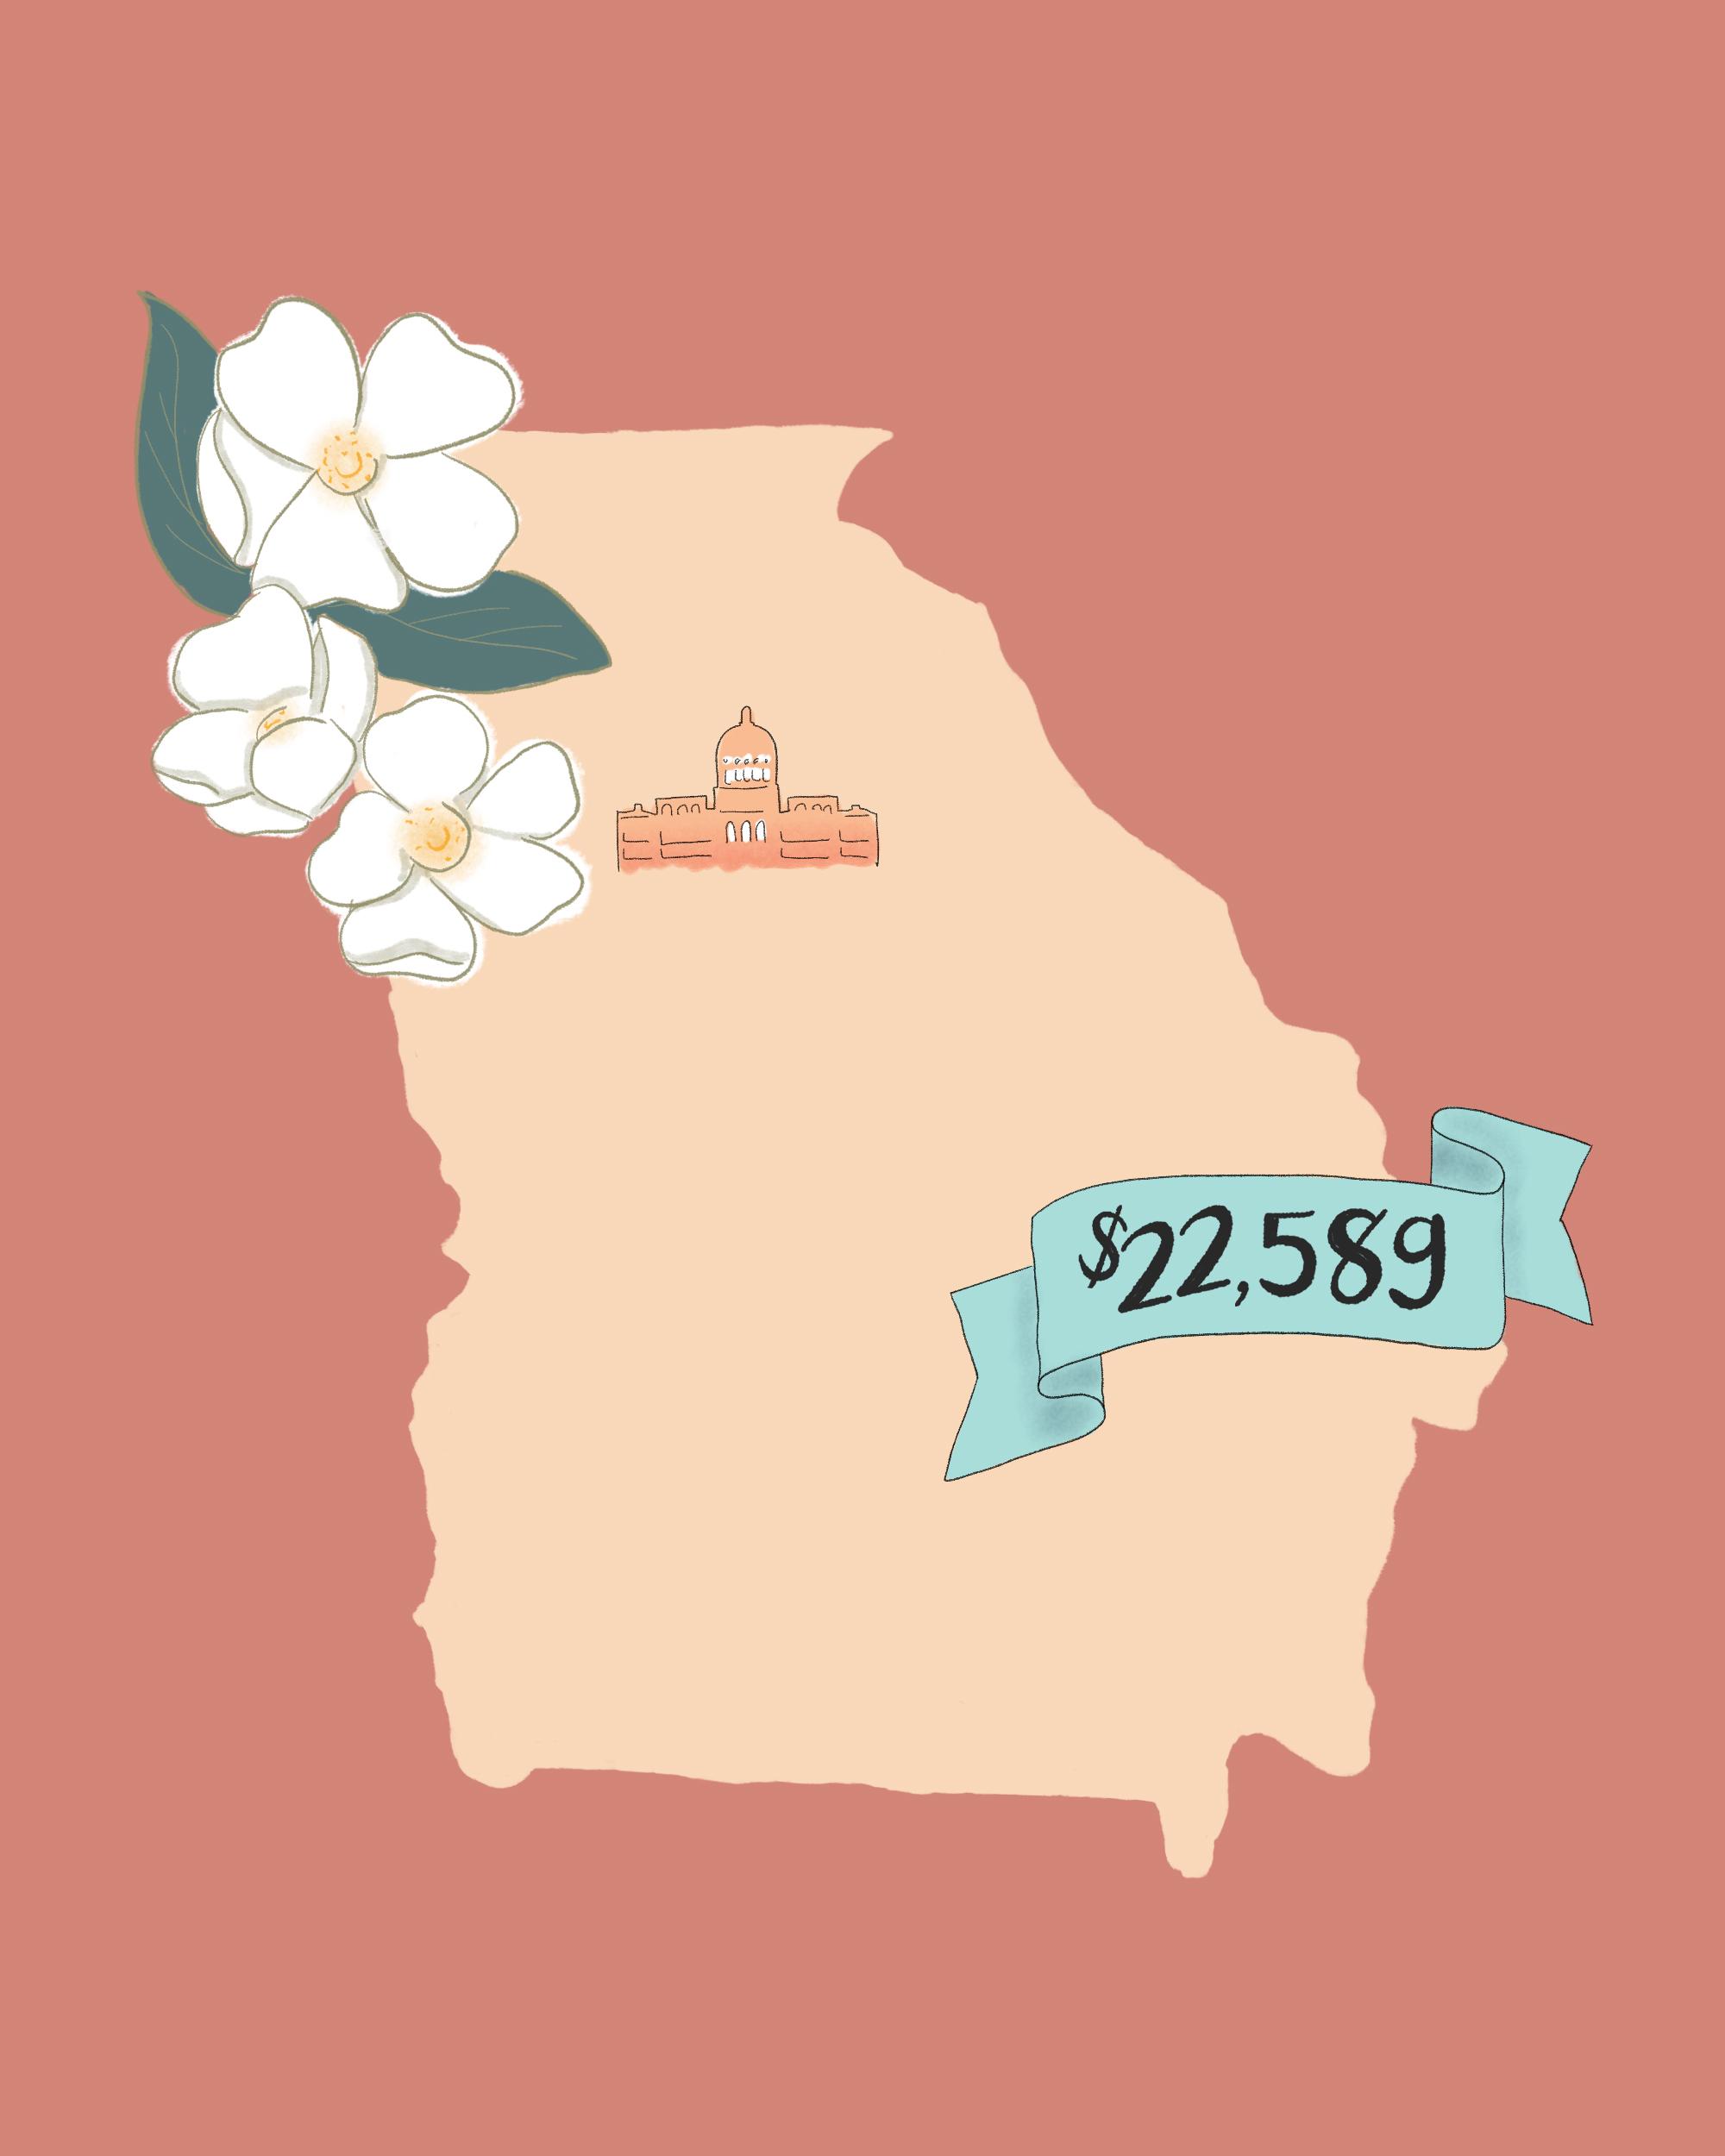 state wedding costs illustration georgia